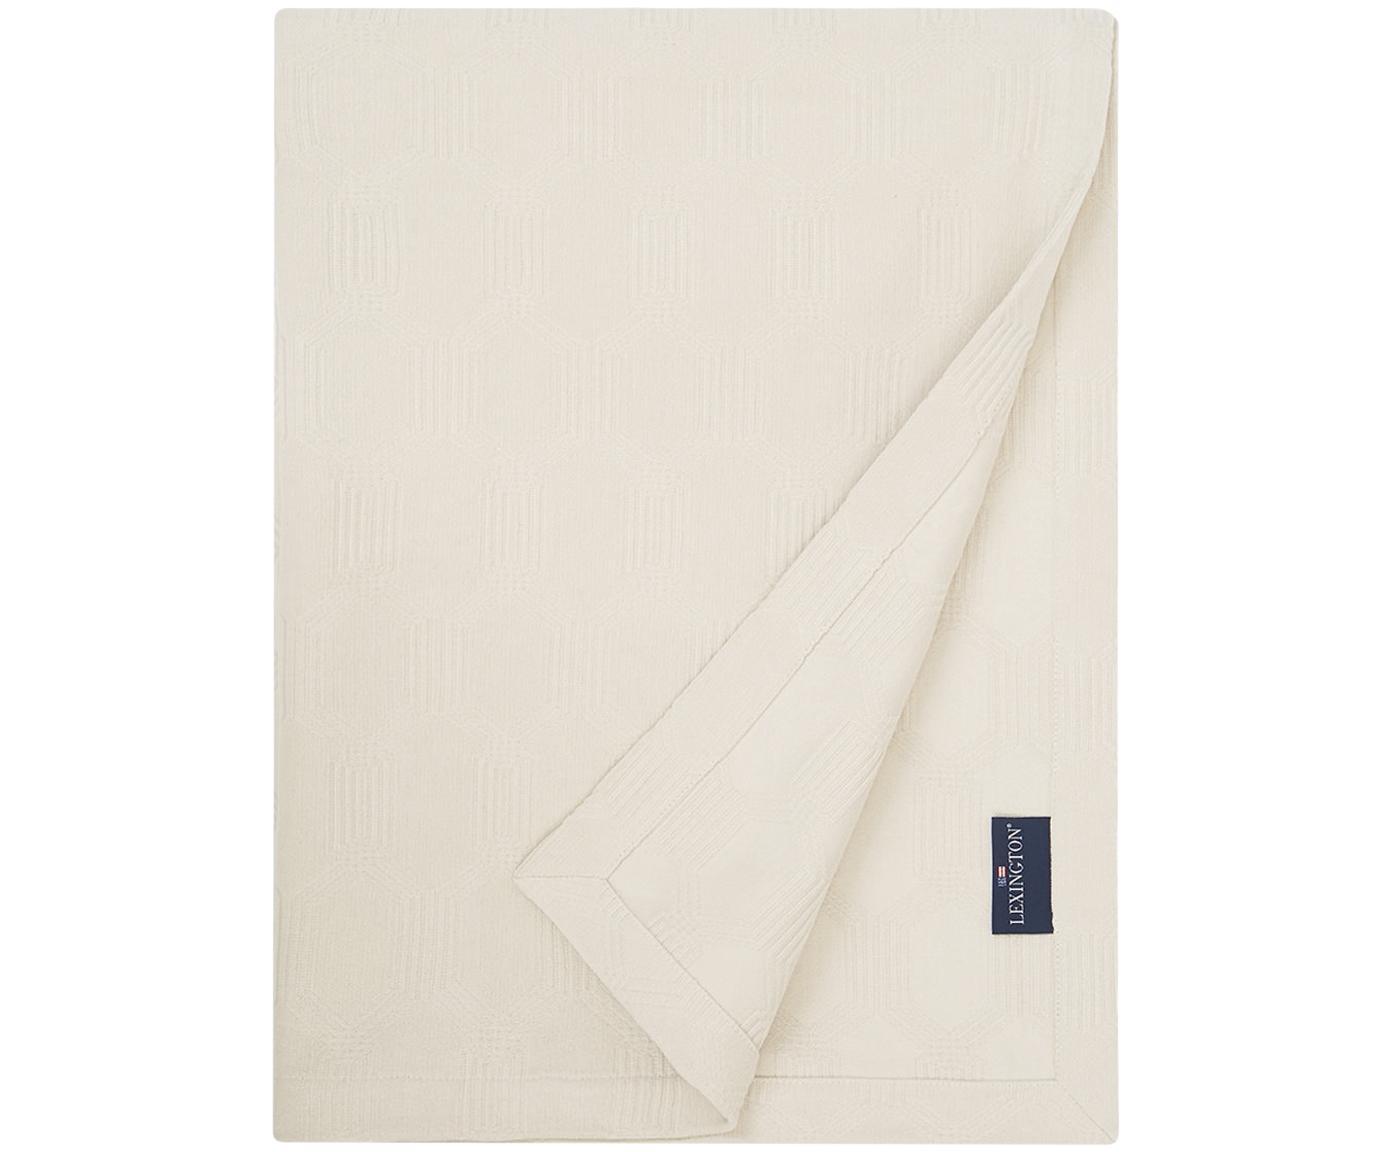 Samt-Tagesdecke Jacky in Offwhite, Webart: Jacquard, Gebrochenes Weiss, 160 x 240 cm